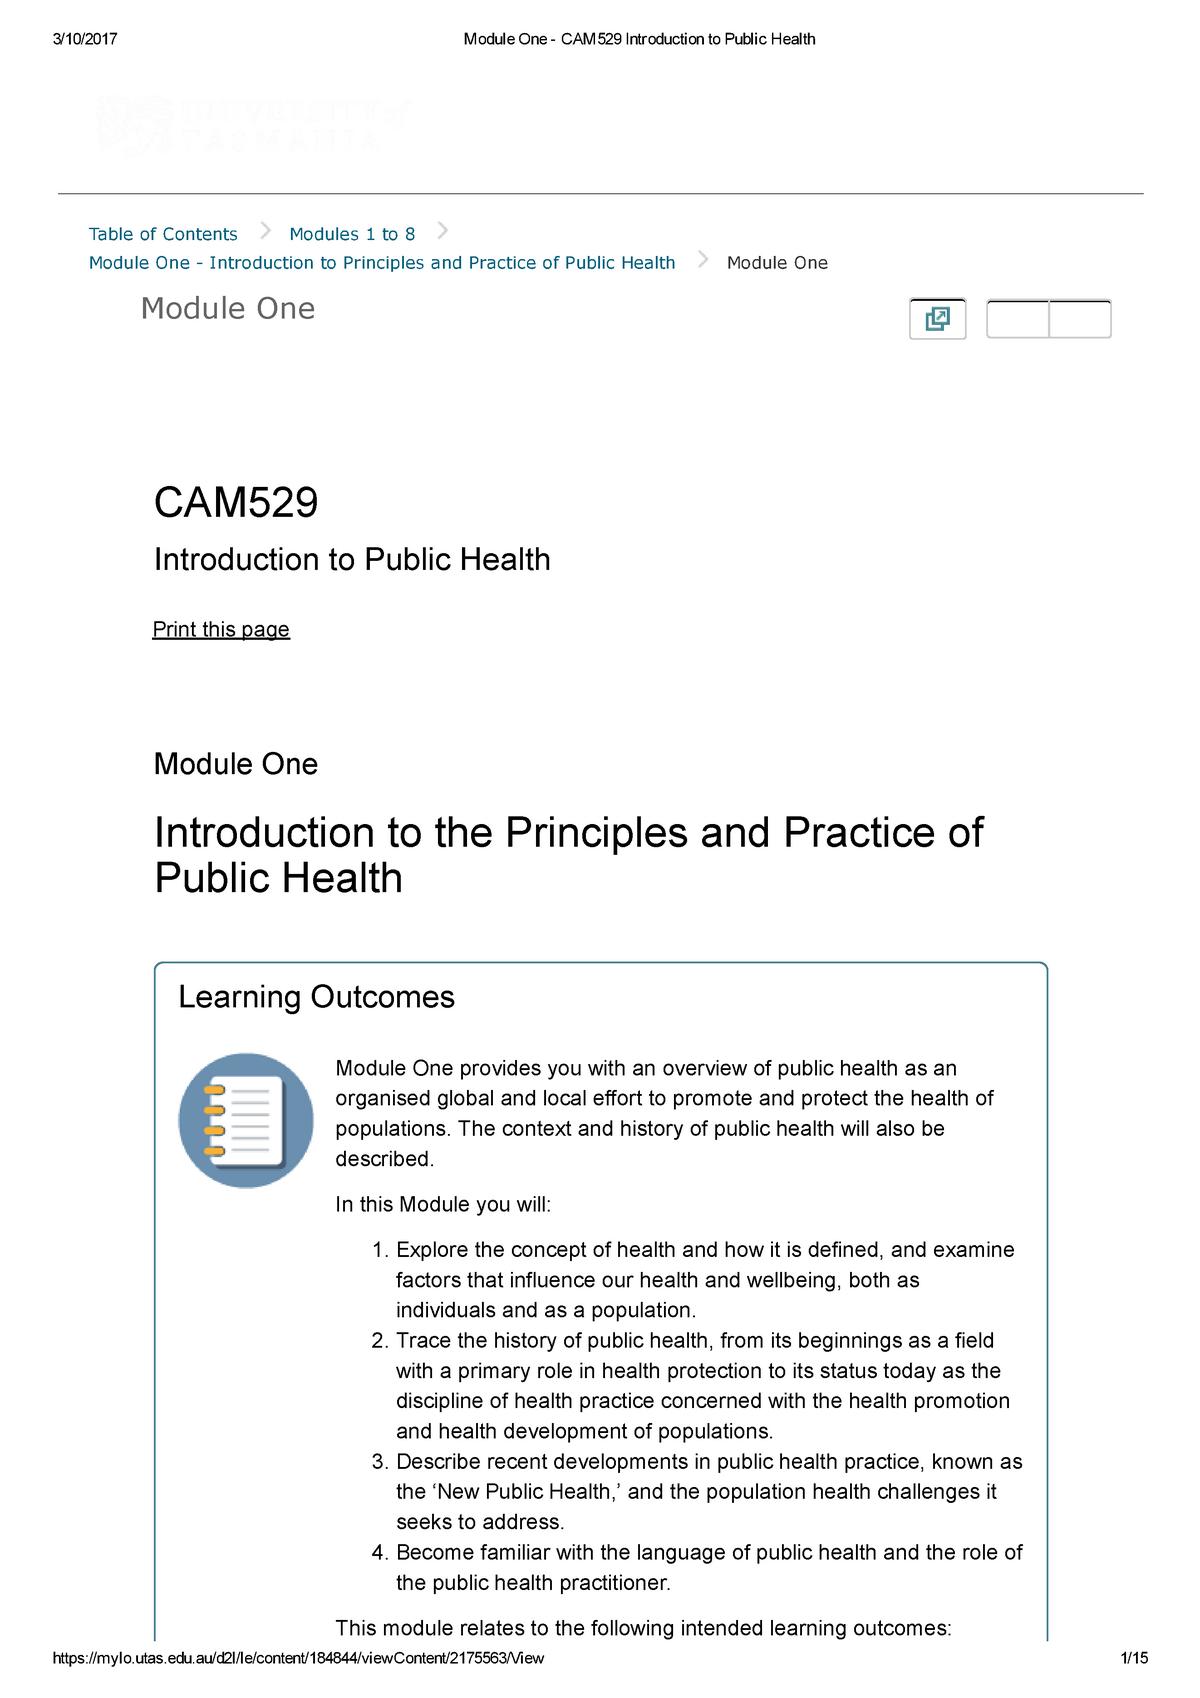 Introduction to Public Health-module one - CAM529 - UTAS